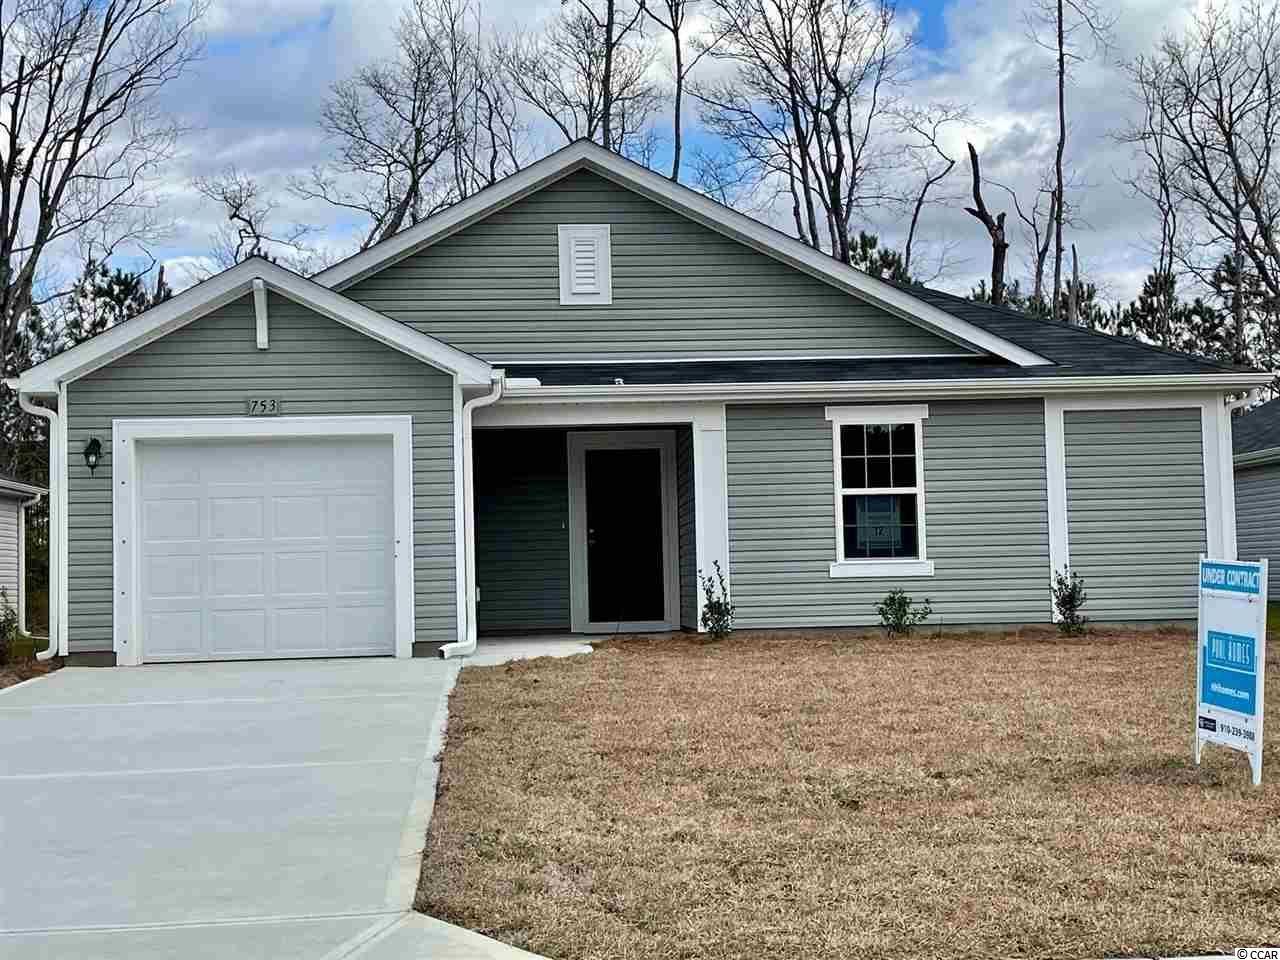 753 Landmark Cove Rd., Carolina Shores, NC 28467 - MLS#: 2022757